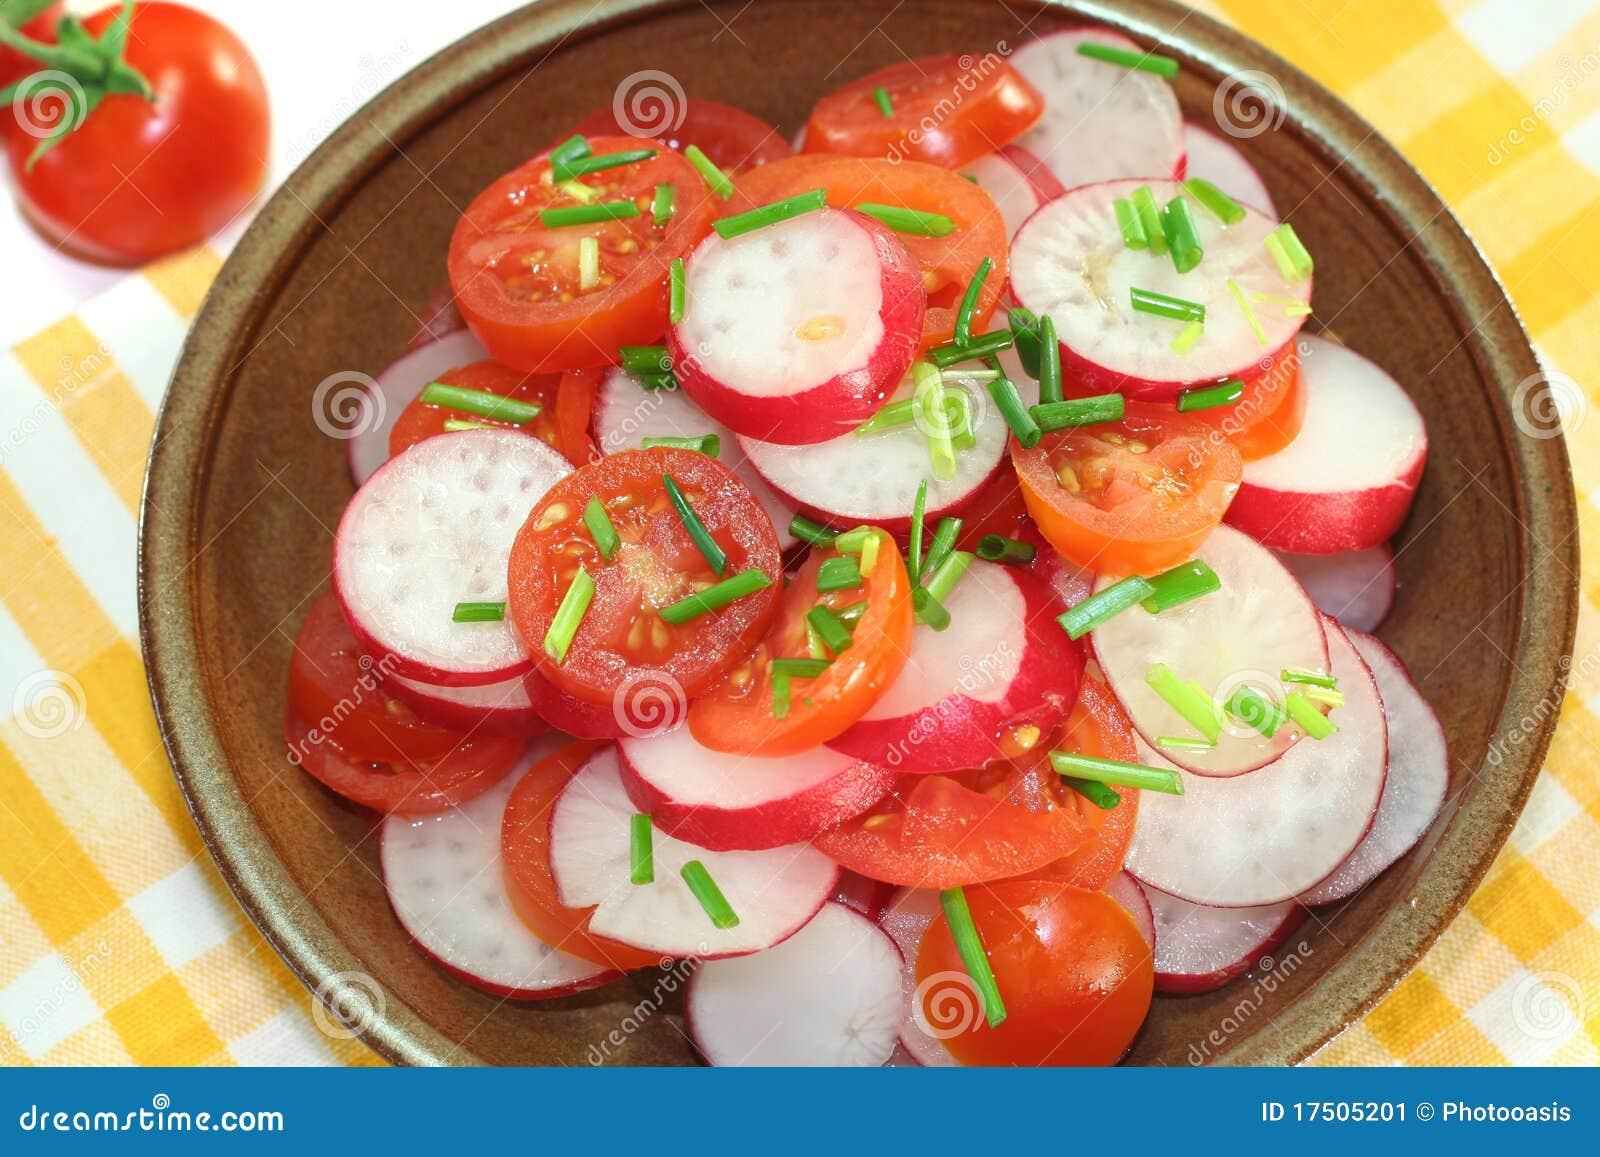 salade de radis et de tomate image stock image 17505201. Black Bedroom Furniture Sets. Home Design Ideas